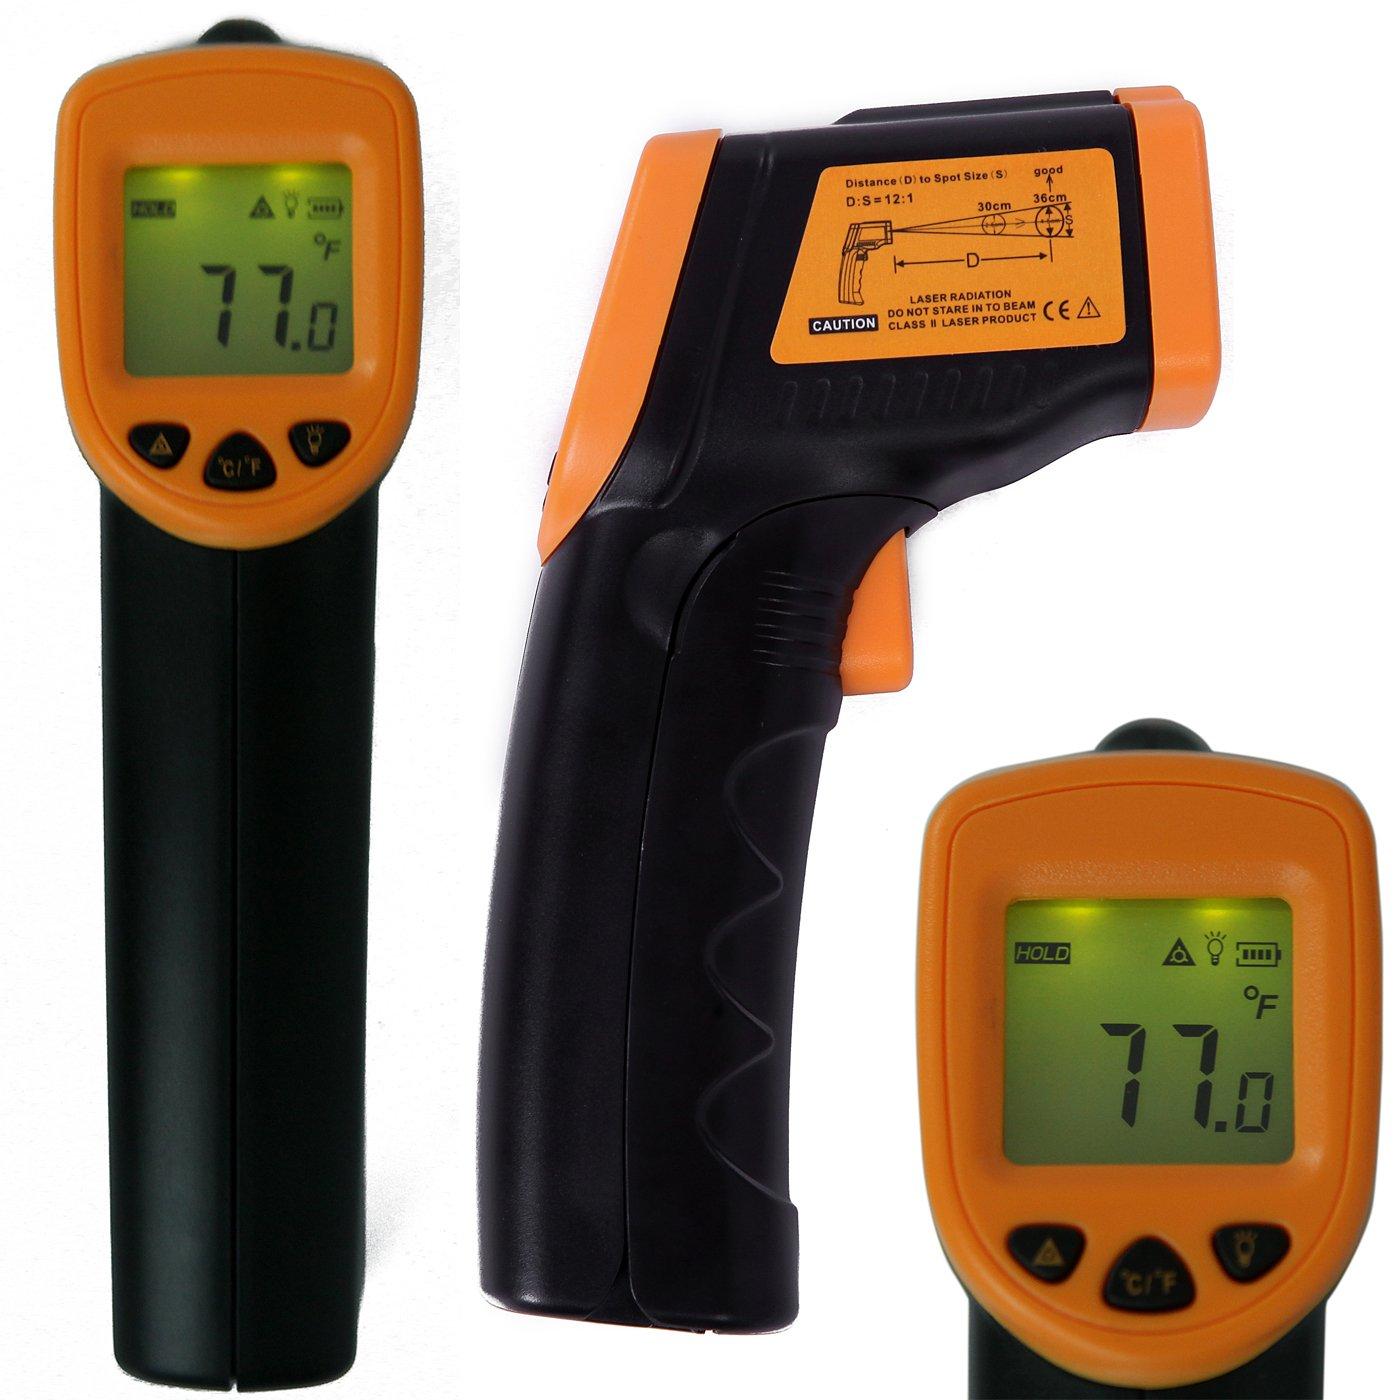 HDE High Accuracy Non-Contact Infrared IR Temperature Gun Digital Thermometer